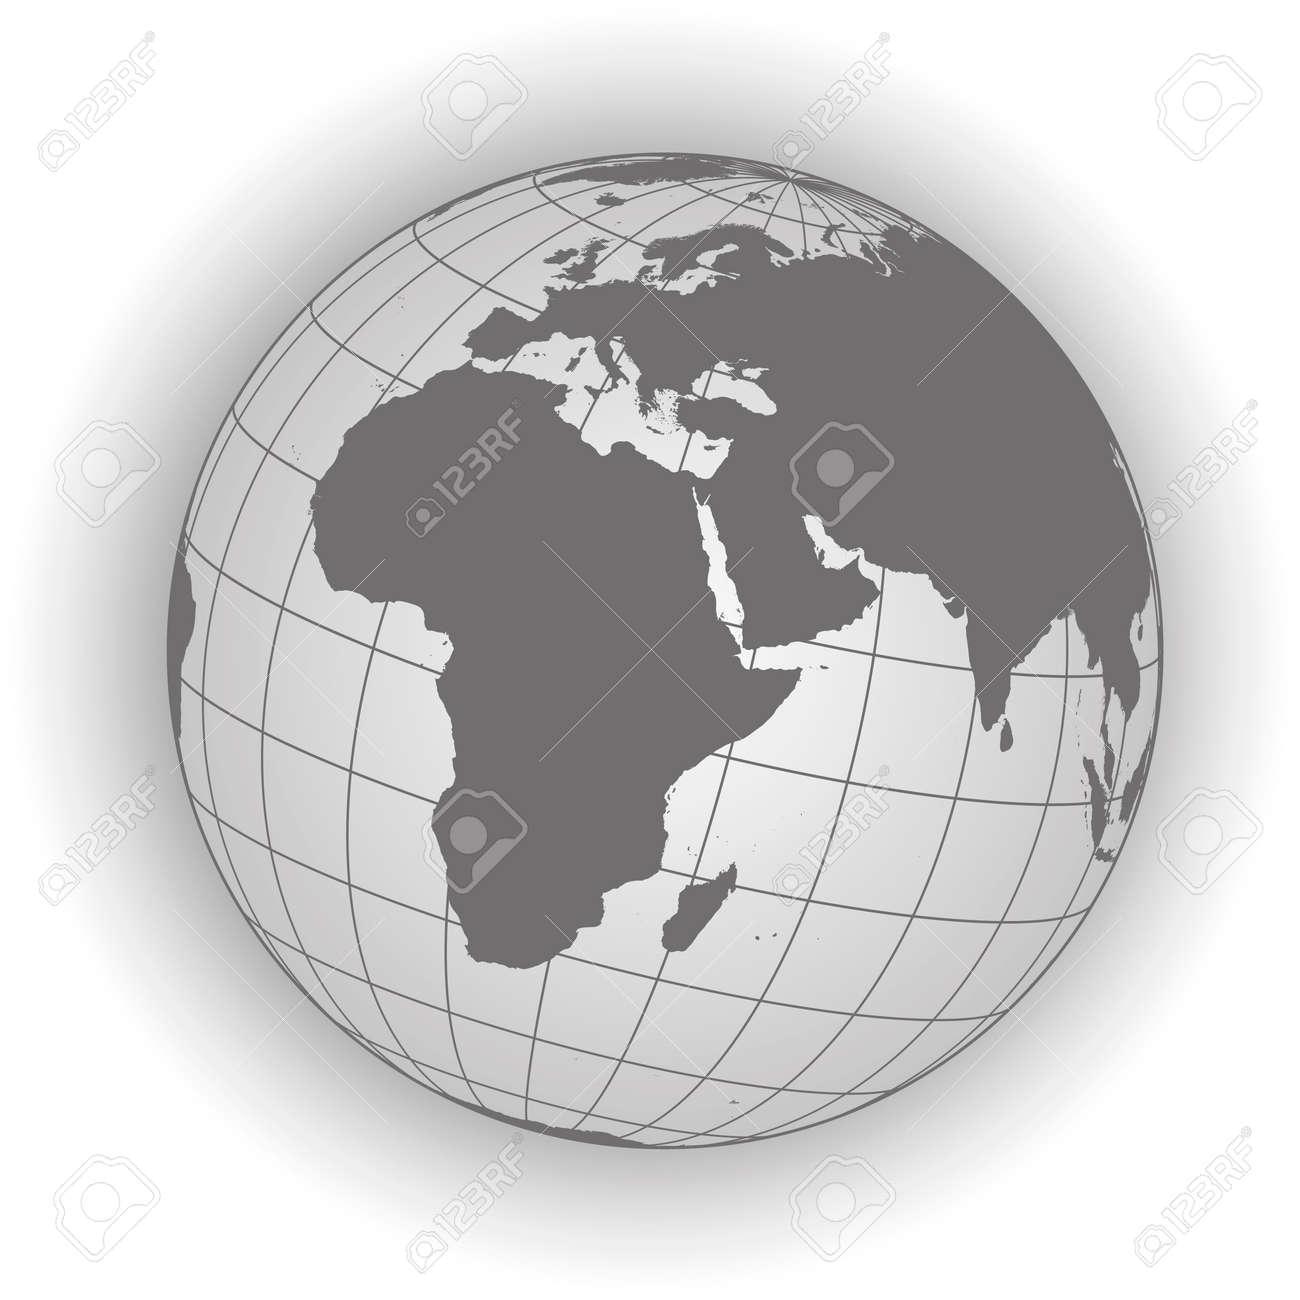 Karte Russland Asien.Stock Photo